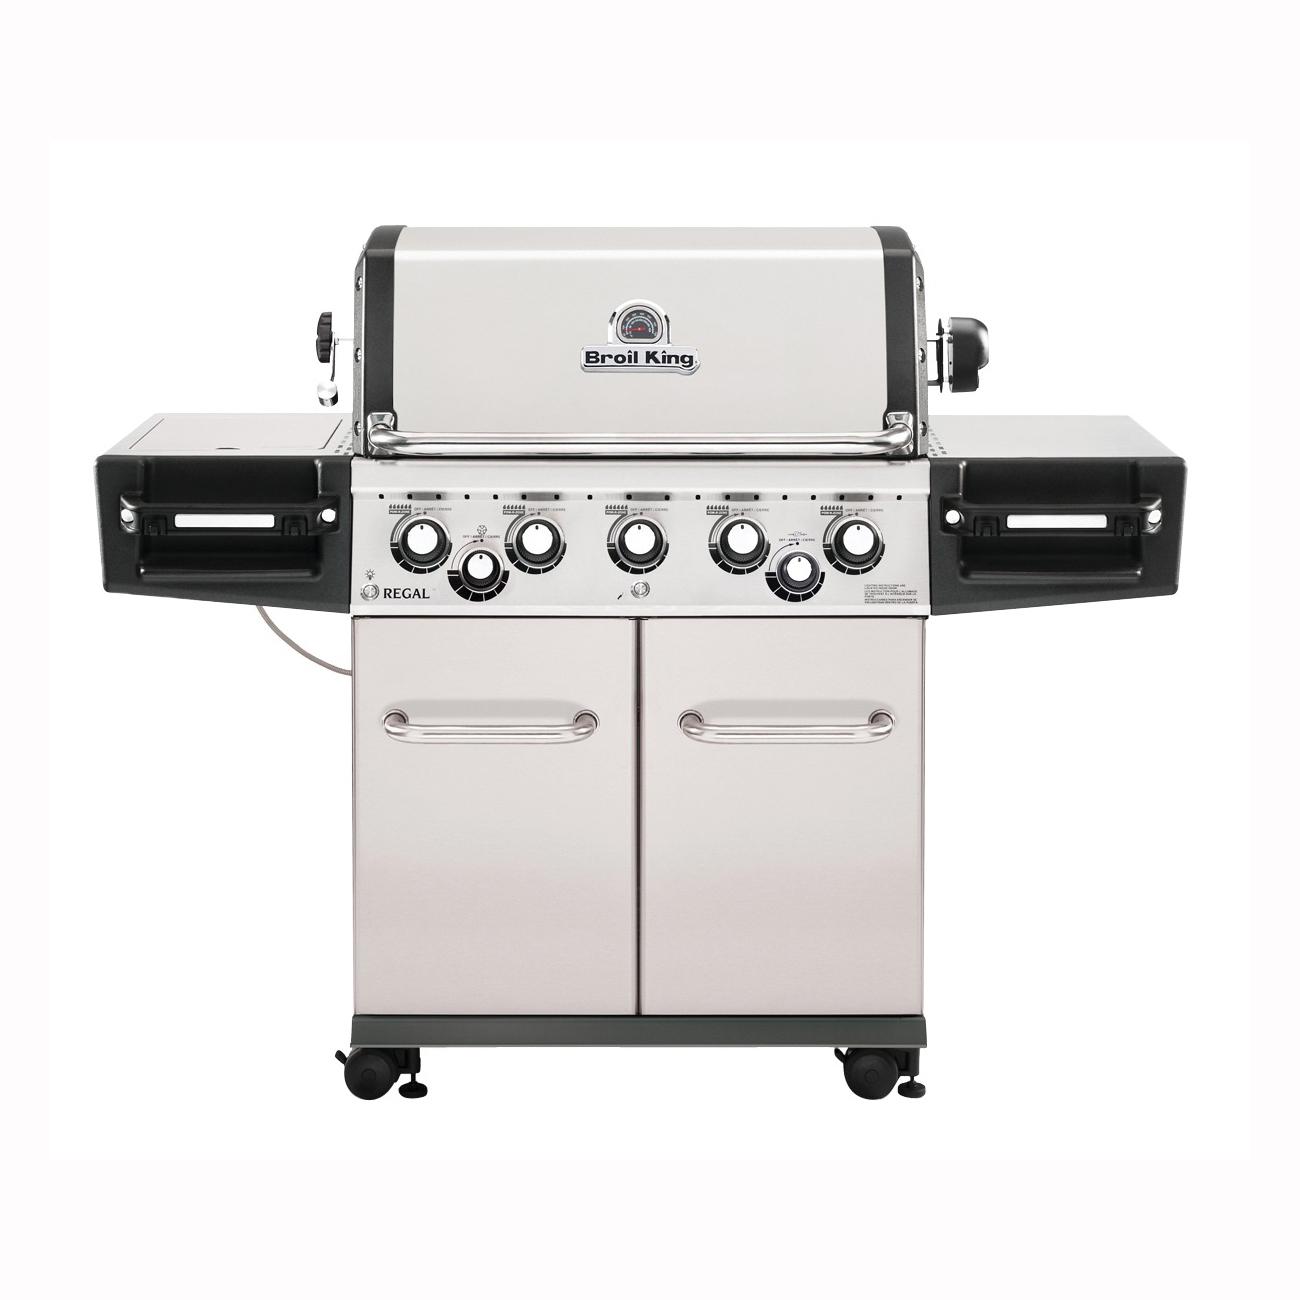 Picture of Broil King Regal 958344 Gas Grill, 55000 Btu/hr BTU, Liquid Propane, 5 -Burner, 625 sq-in Primary Cooking Surface